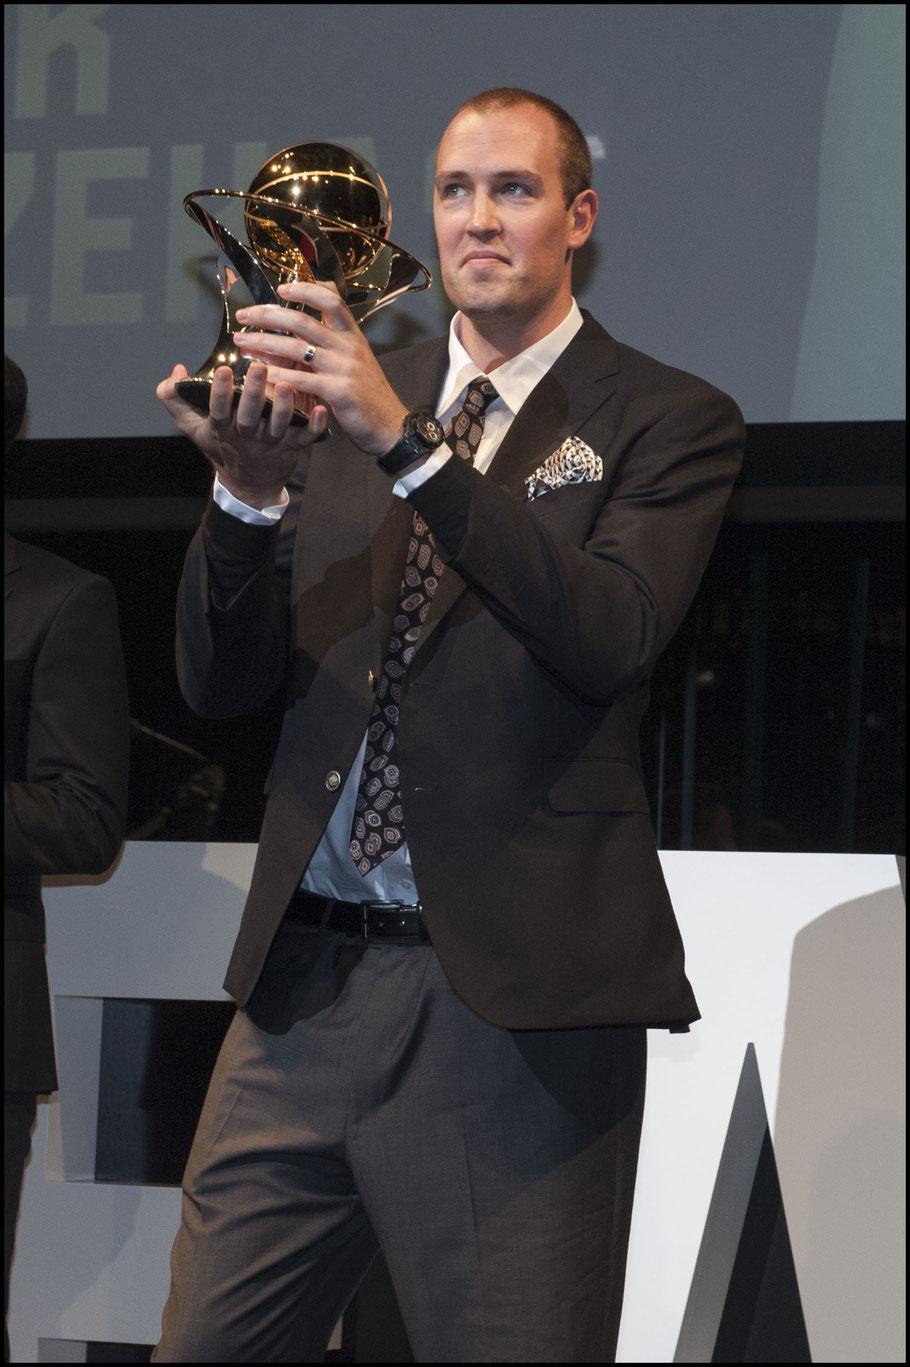 Nick Fazekas took home the MVP award - Chris Pfaff, Inside Sport: Japan, May 30, 2017